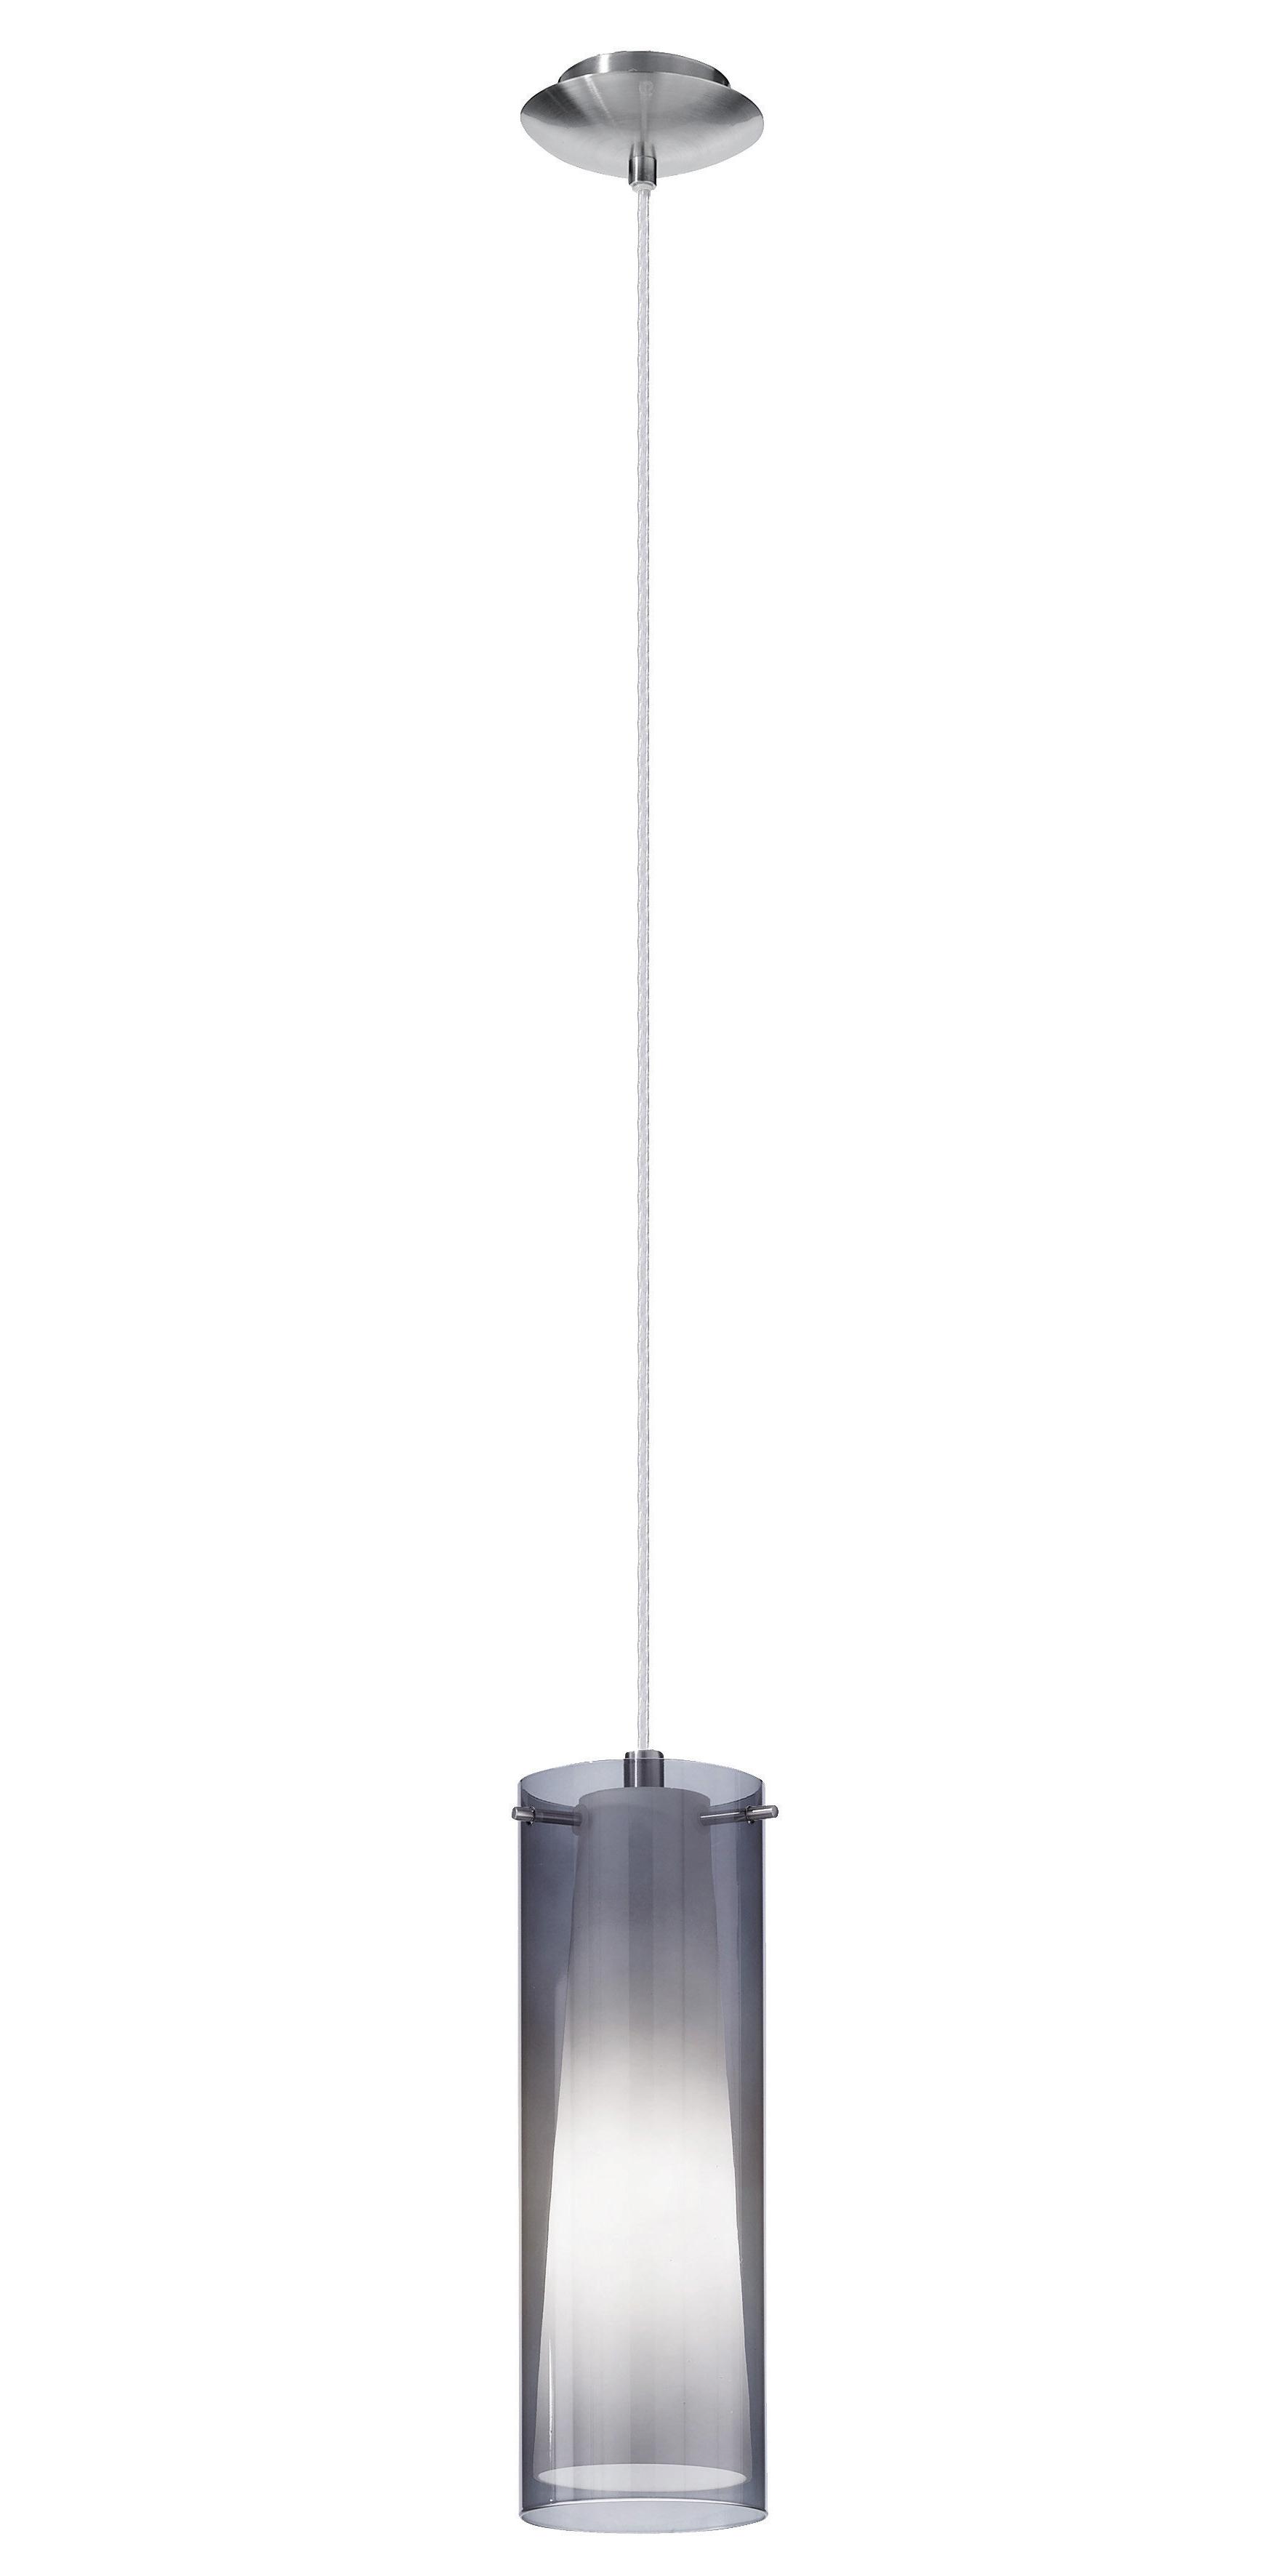 Fashionable Fennia 1 Light Single Cylinder Pendants Intended For Julia 1 Light Single Cylinder Pendant (View 4 of 20)